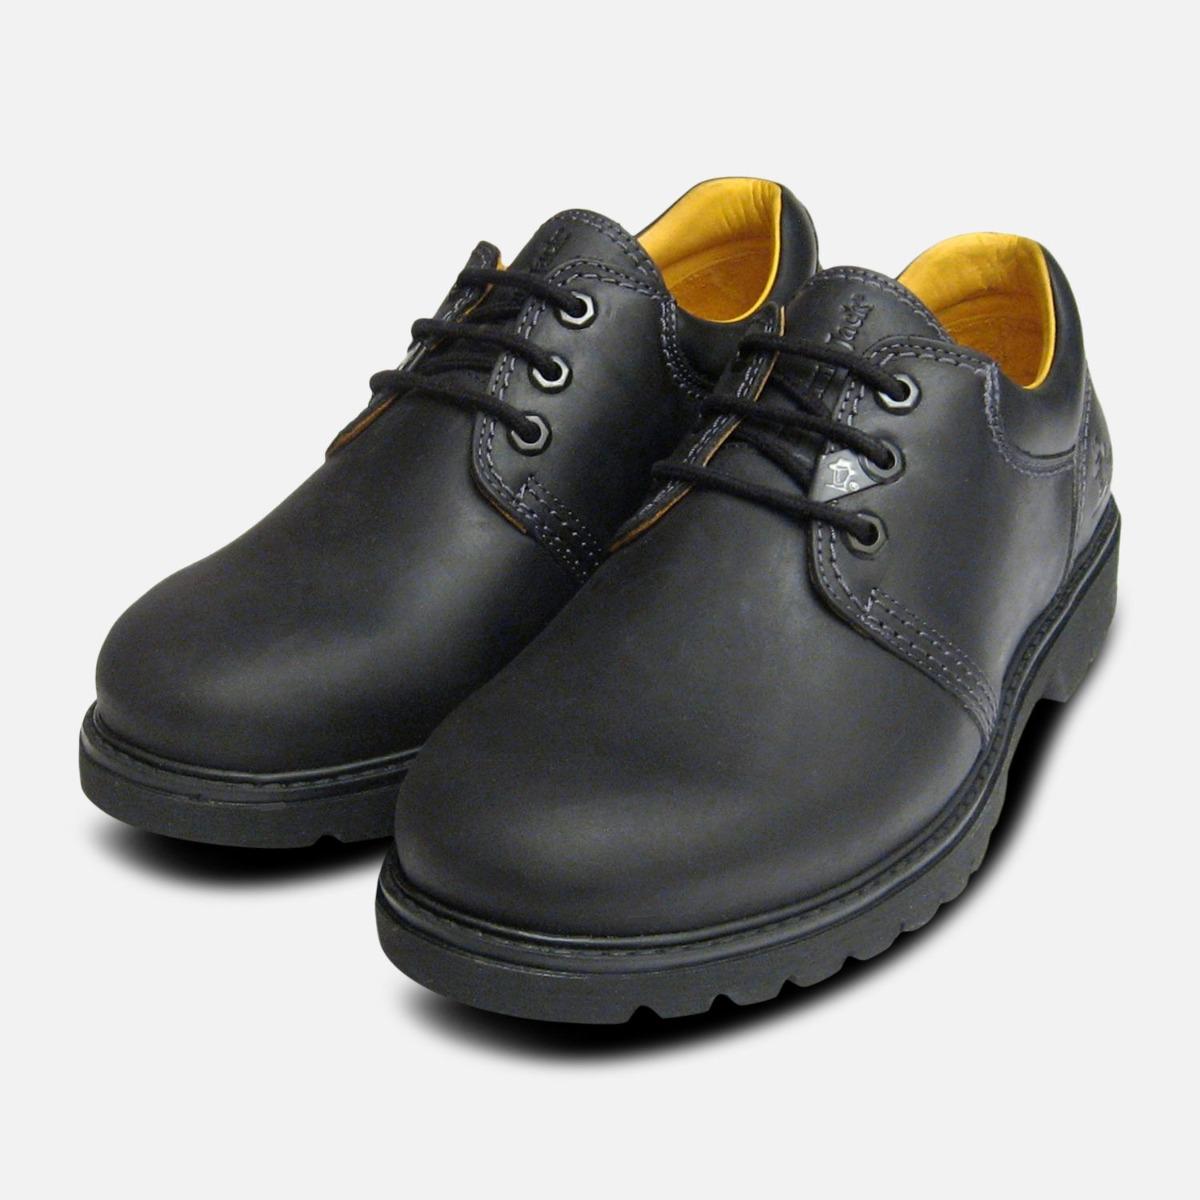 timeless design 67262 12086 Details zu Master Panama Jack 02 C3 Schwarz Fettleder Wasserfest Havana Joe  Schuhe